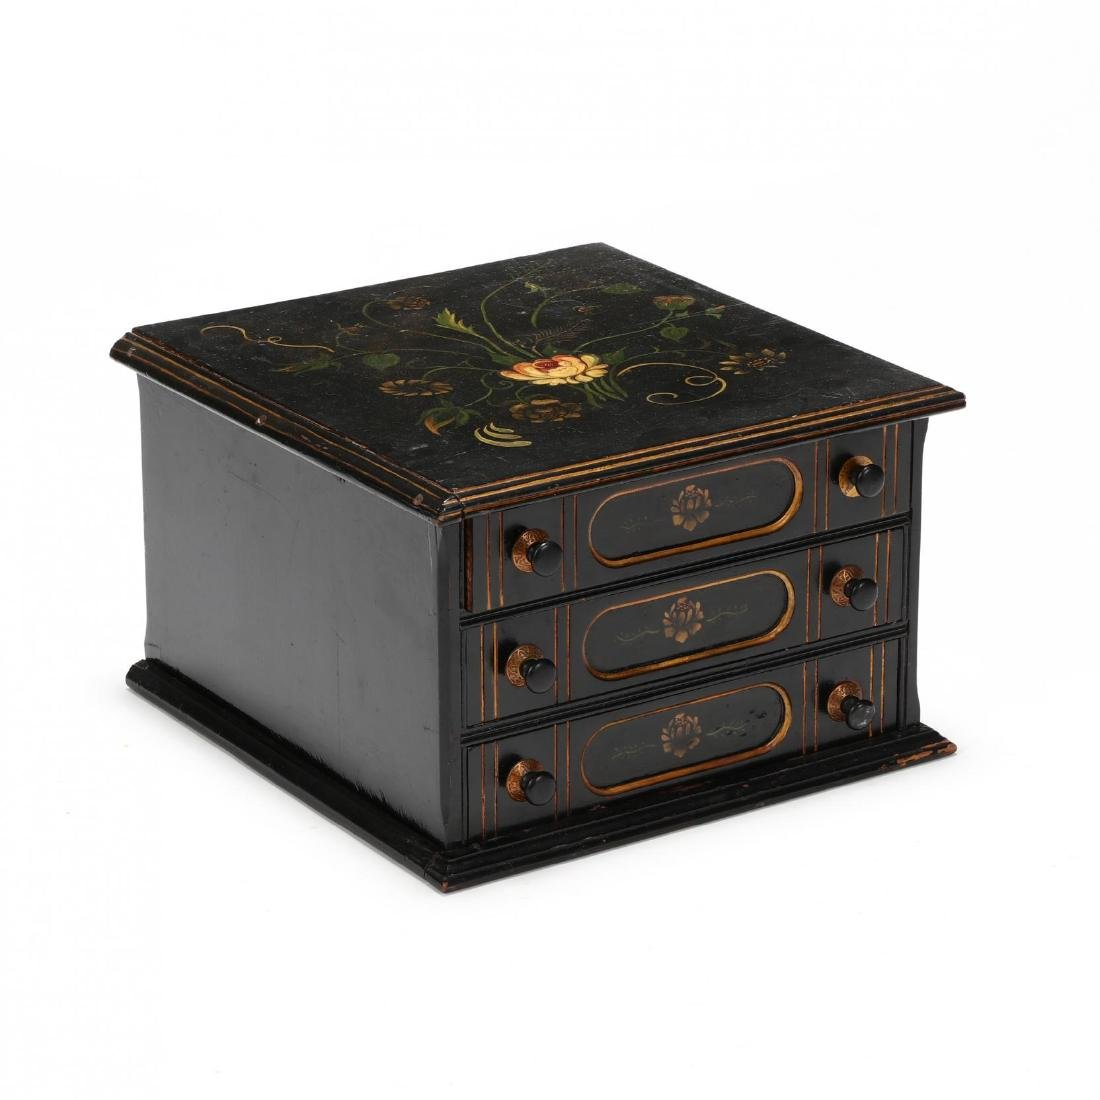 Antique Stenciled Spool Cabinet